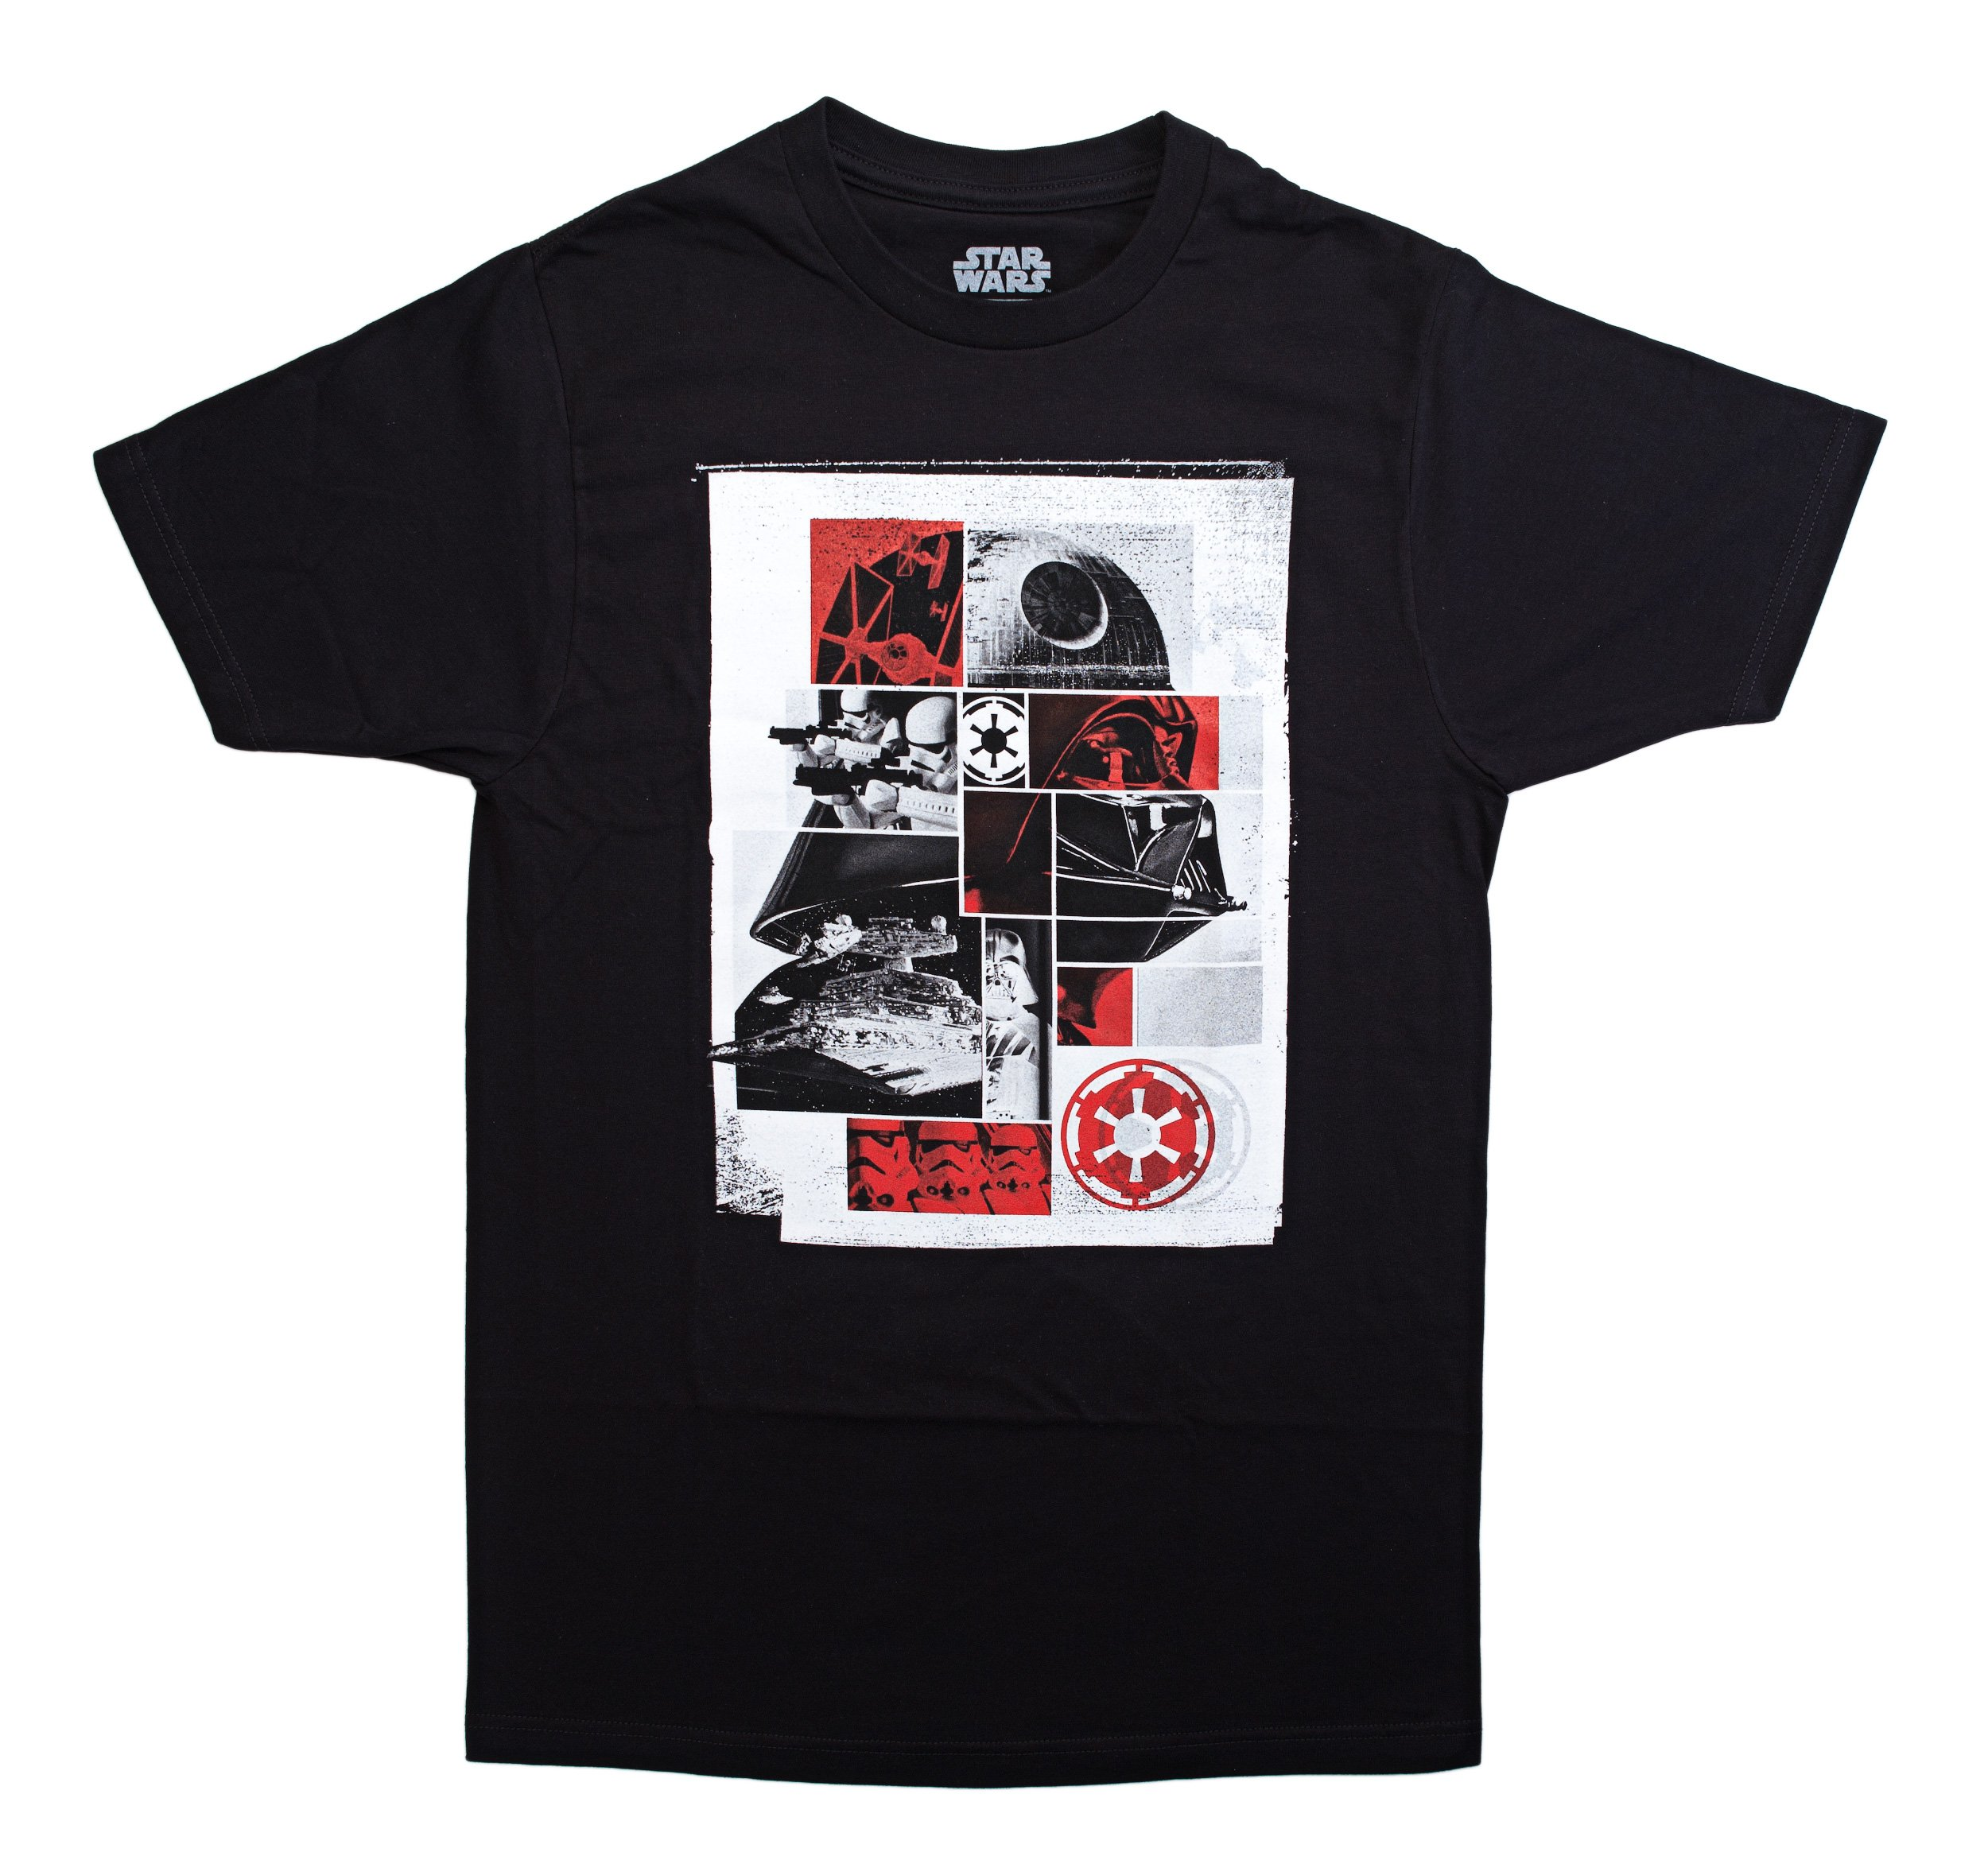 Star Wars Vader Grid Collage Graphic T-Shirt | 2XL